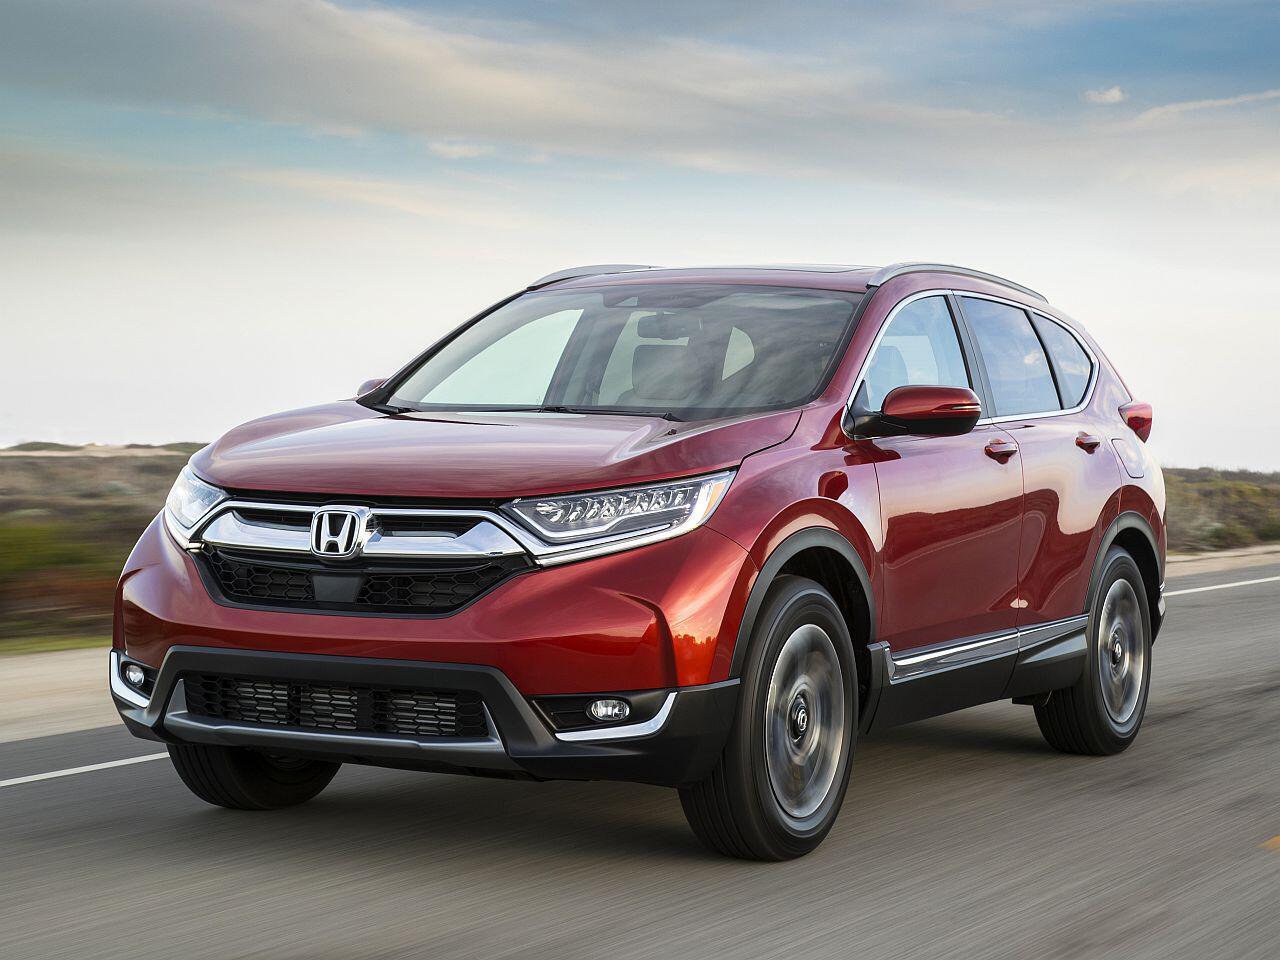 Bild zu Platz 5: Honda CR-V